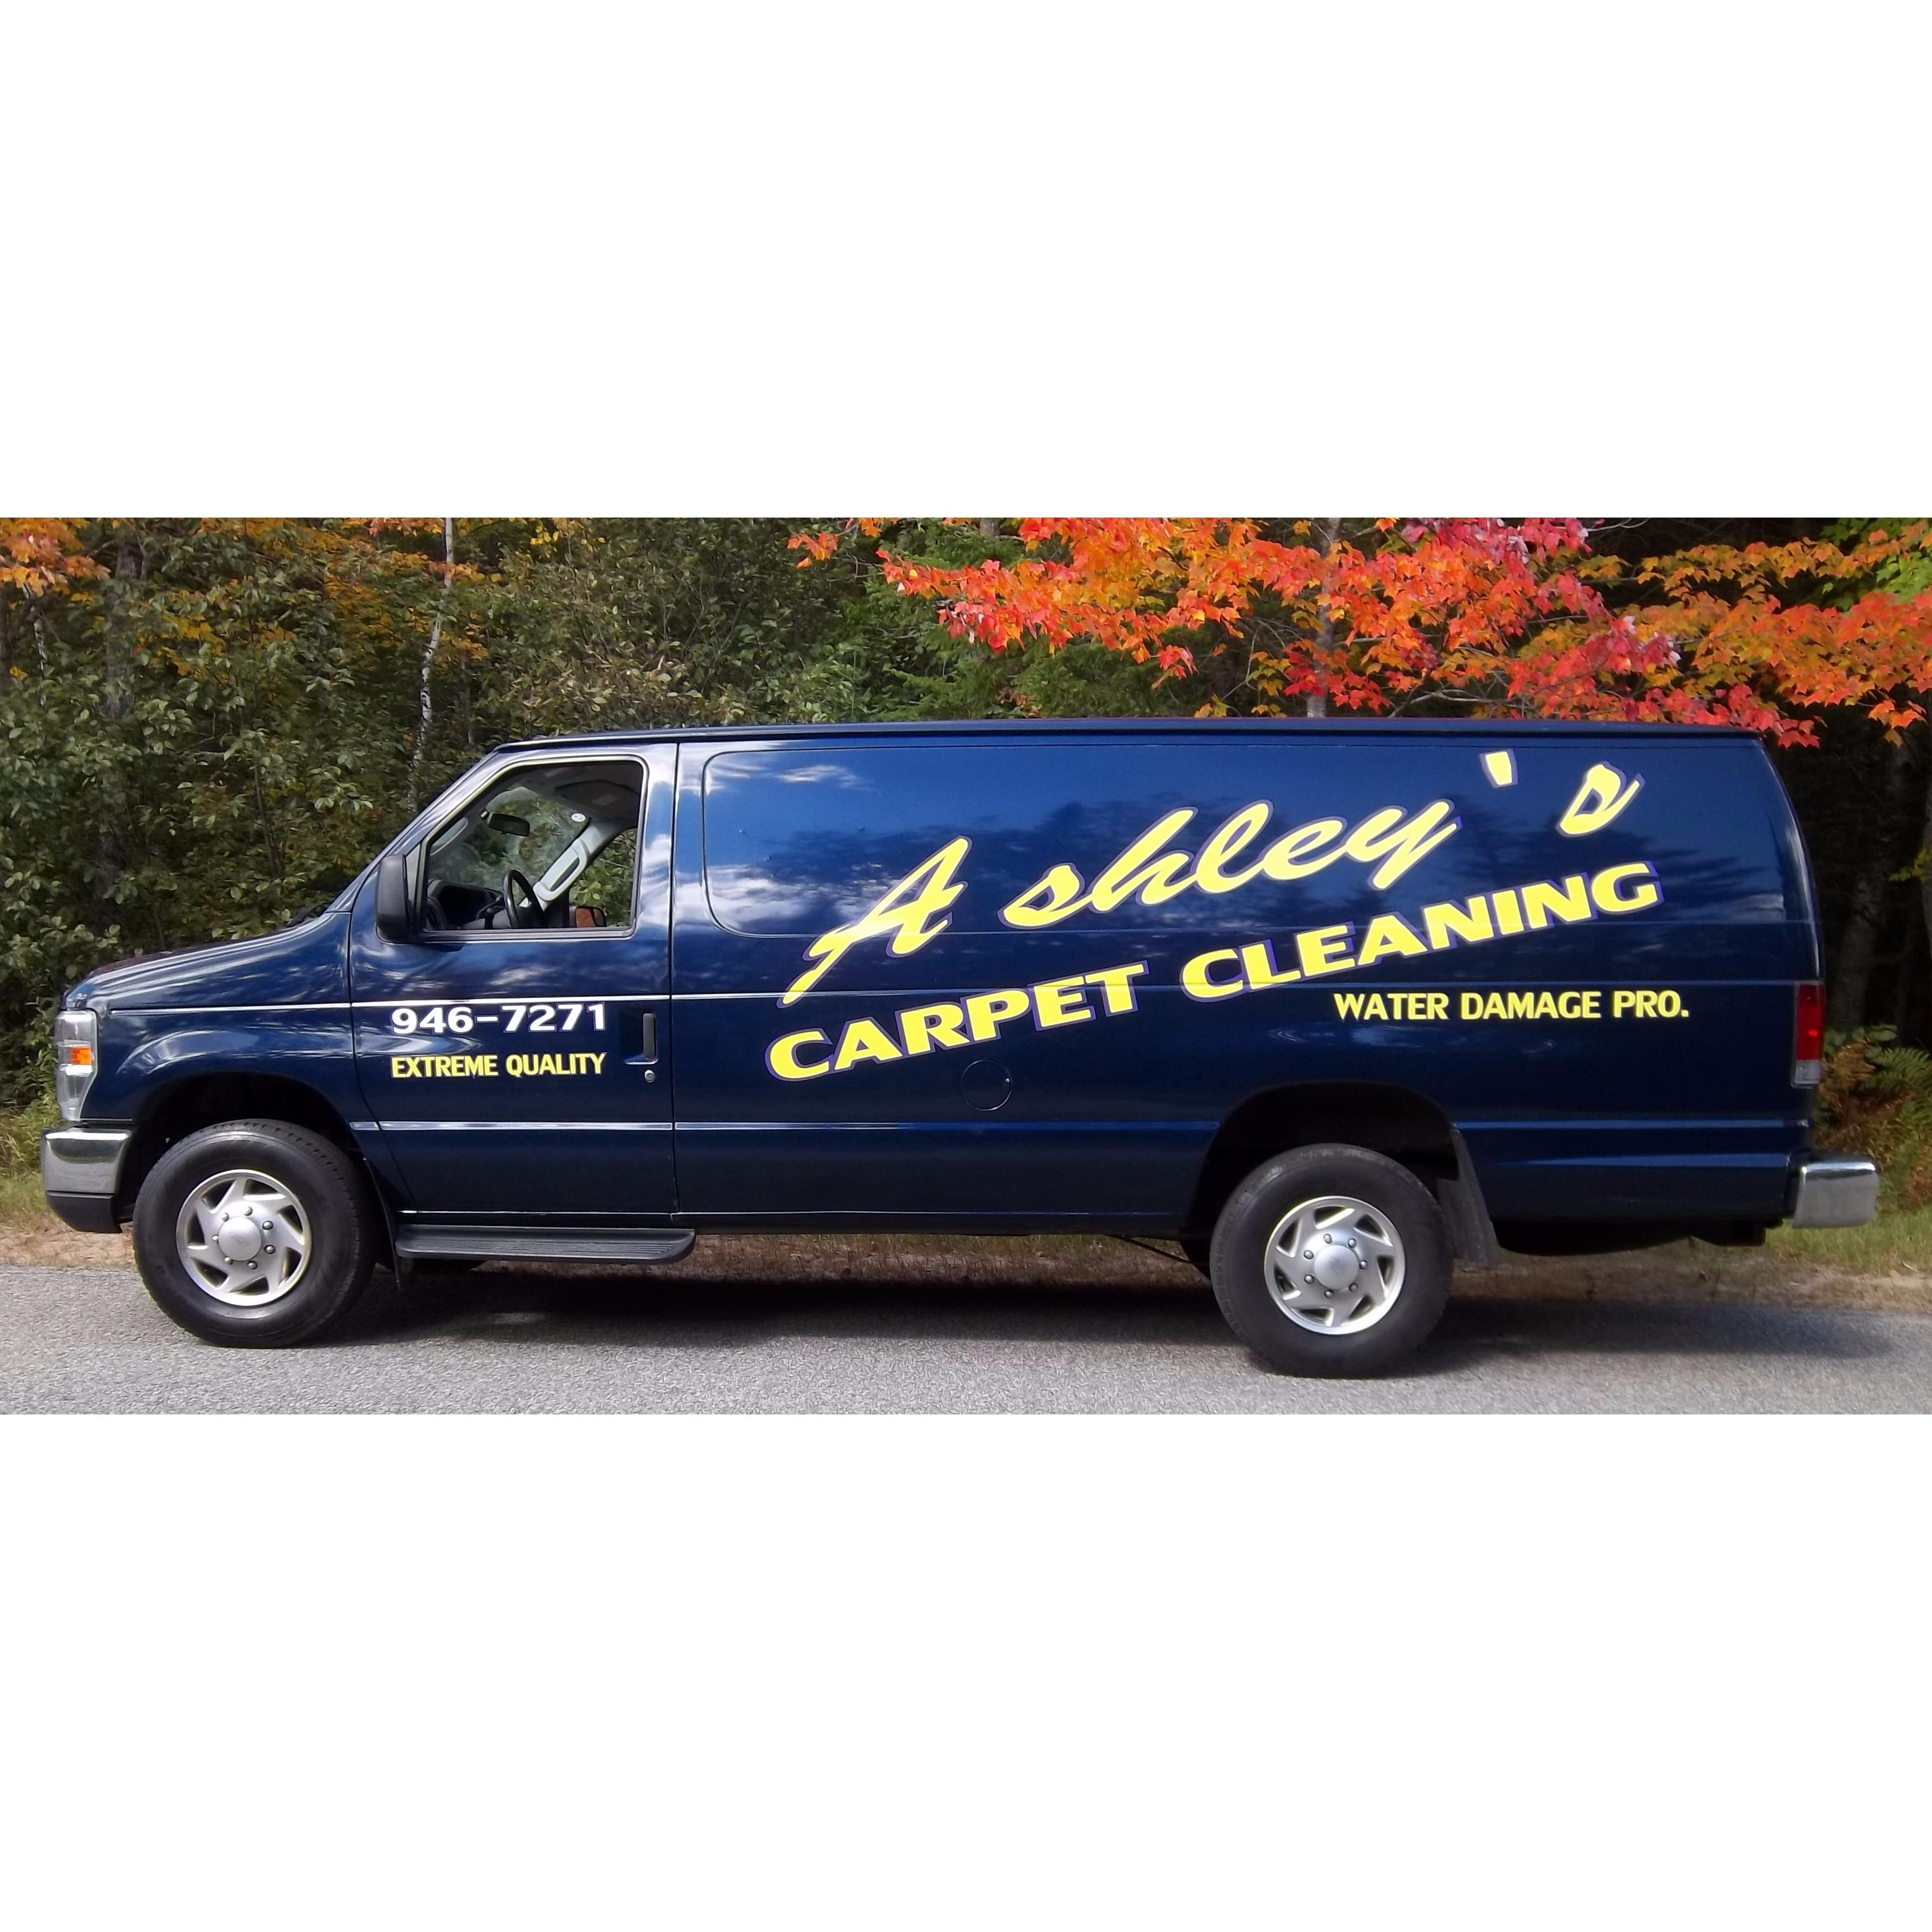 Ashley's Carpet Cleaning Llc